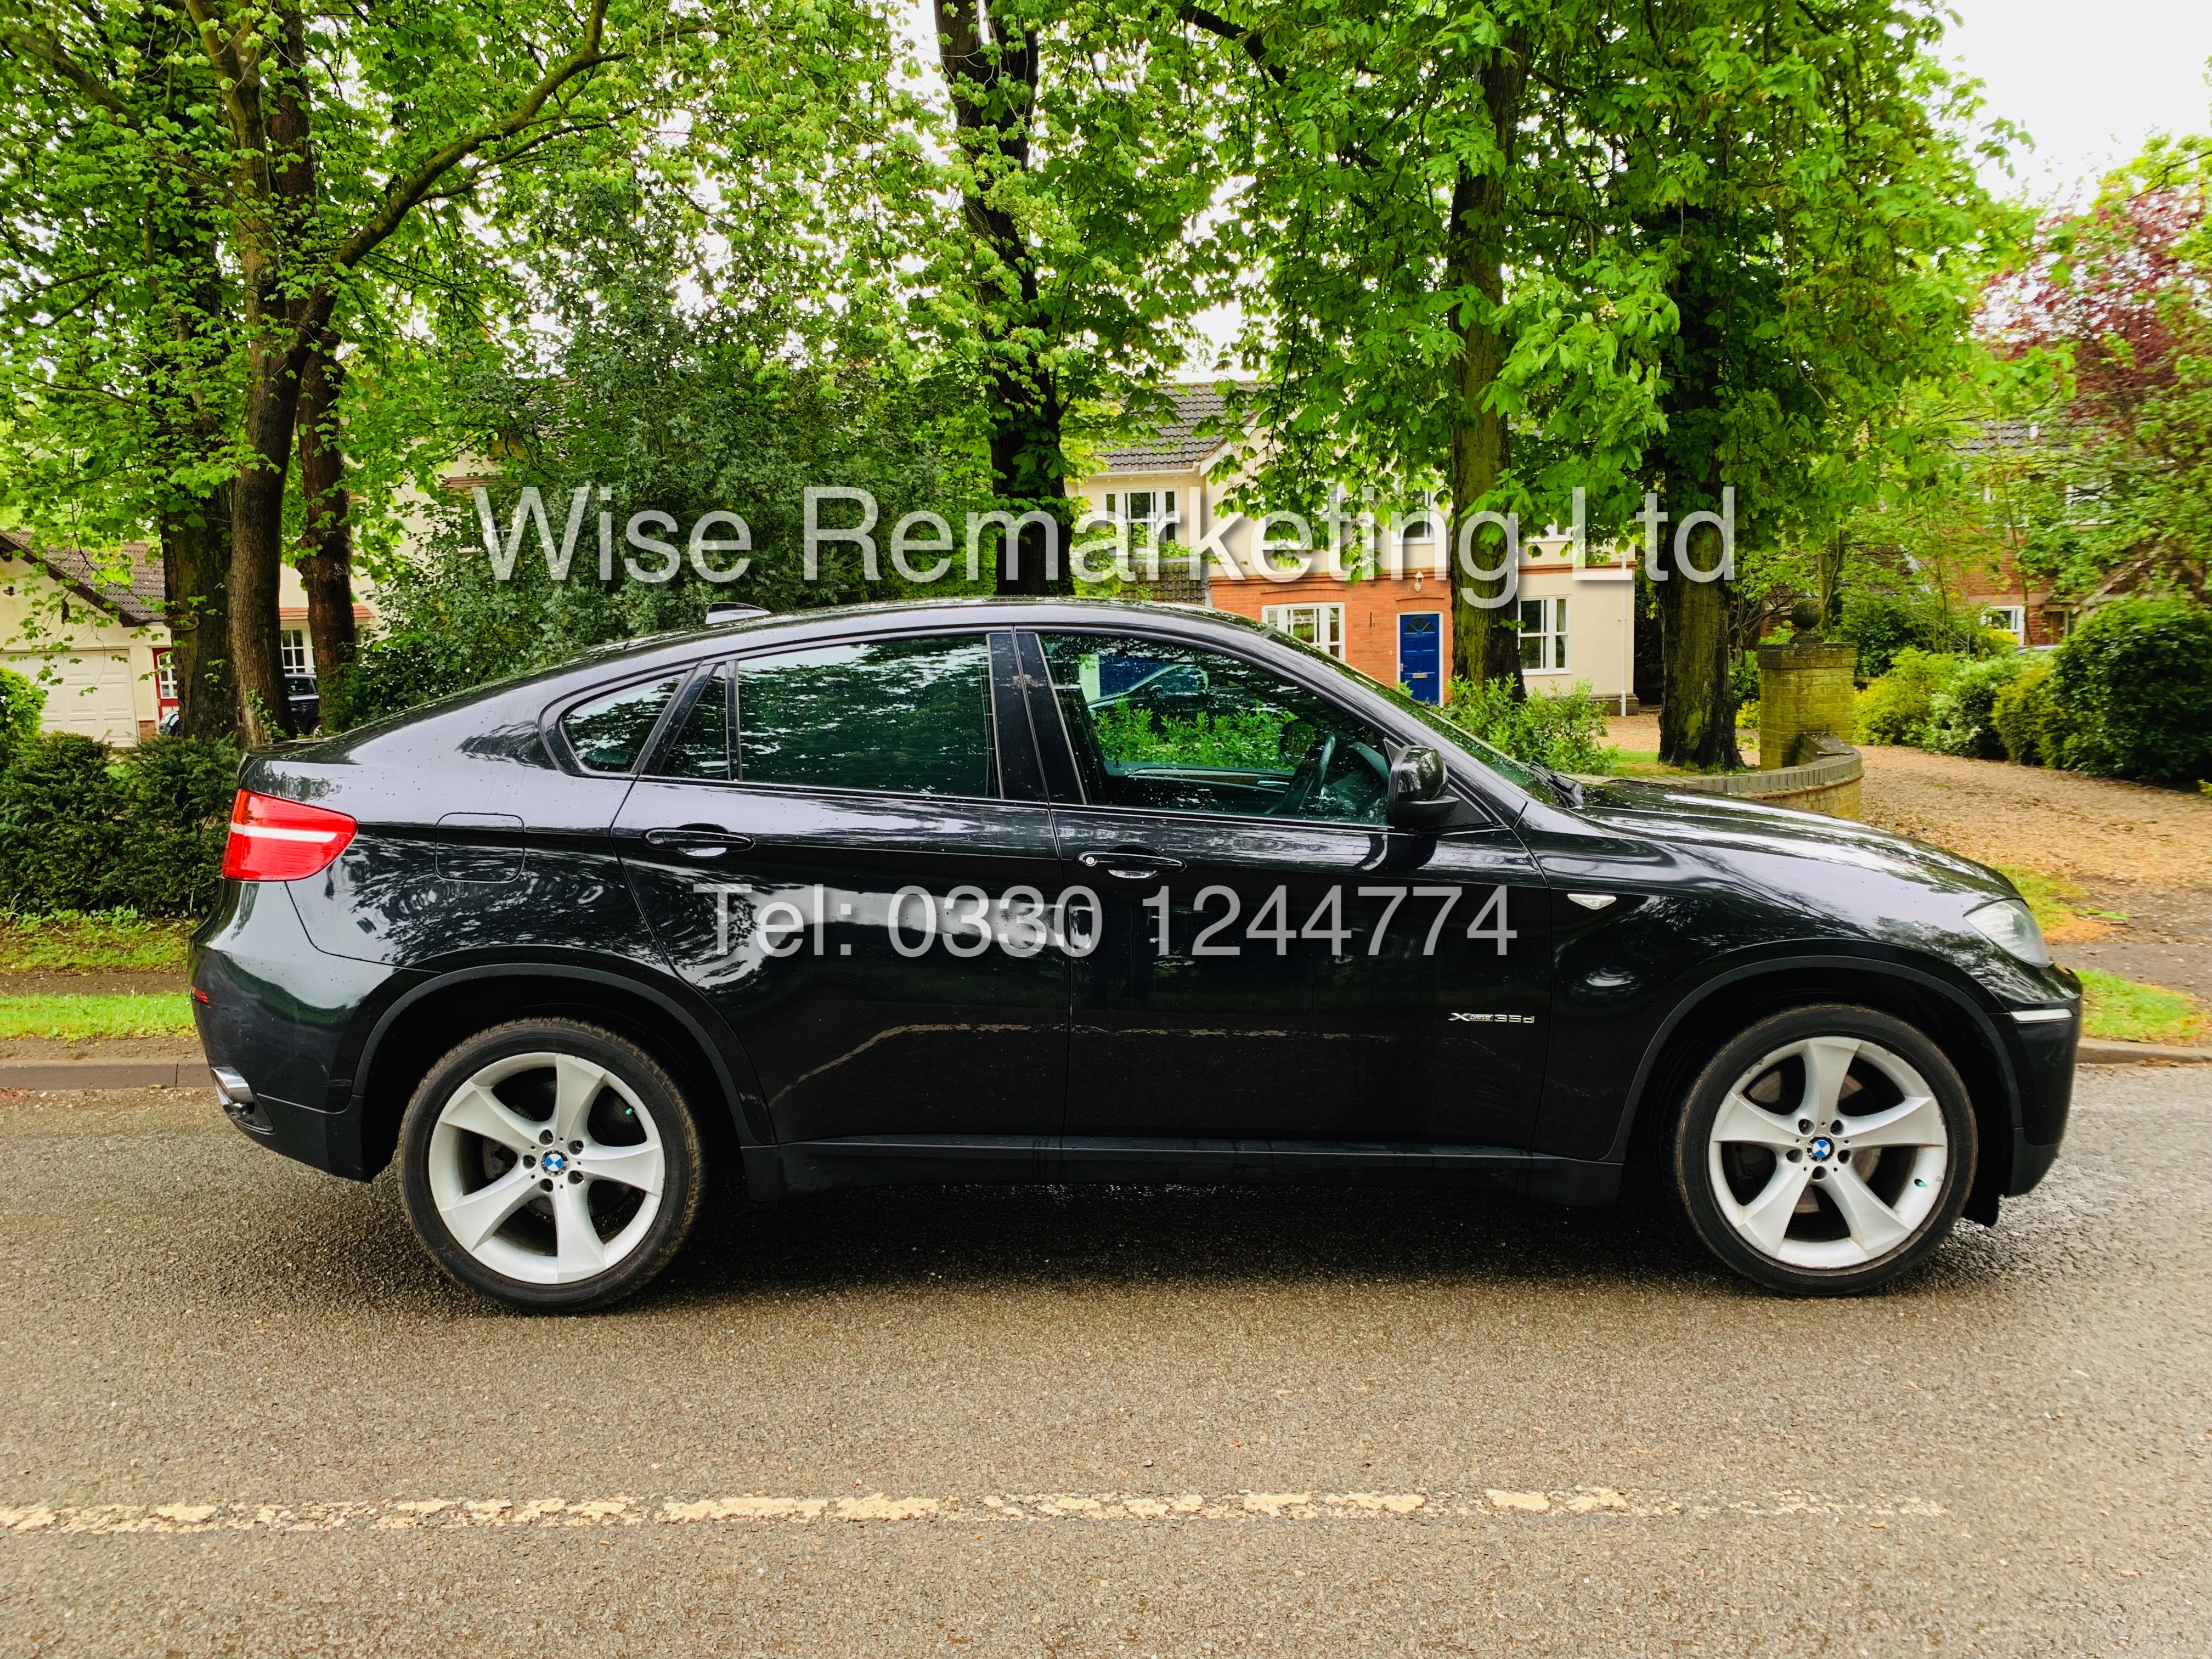 Lot 16 - BMW X6 XDRIVE 35D AUTO (2009 SPEC) *1 PREVIOUS OWNER* PARKING AID - SAT NAV - FSH